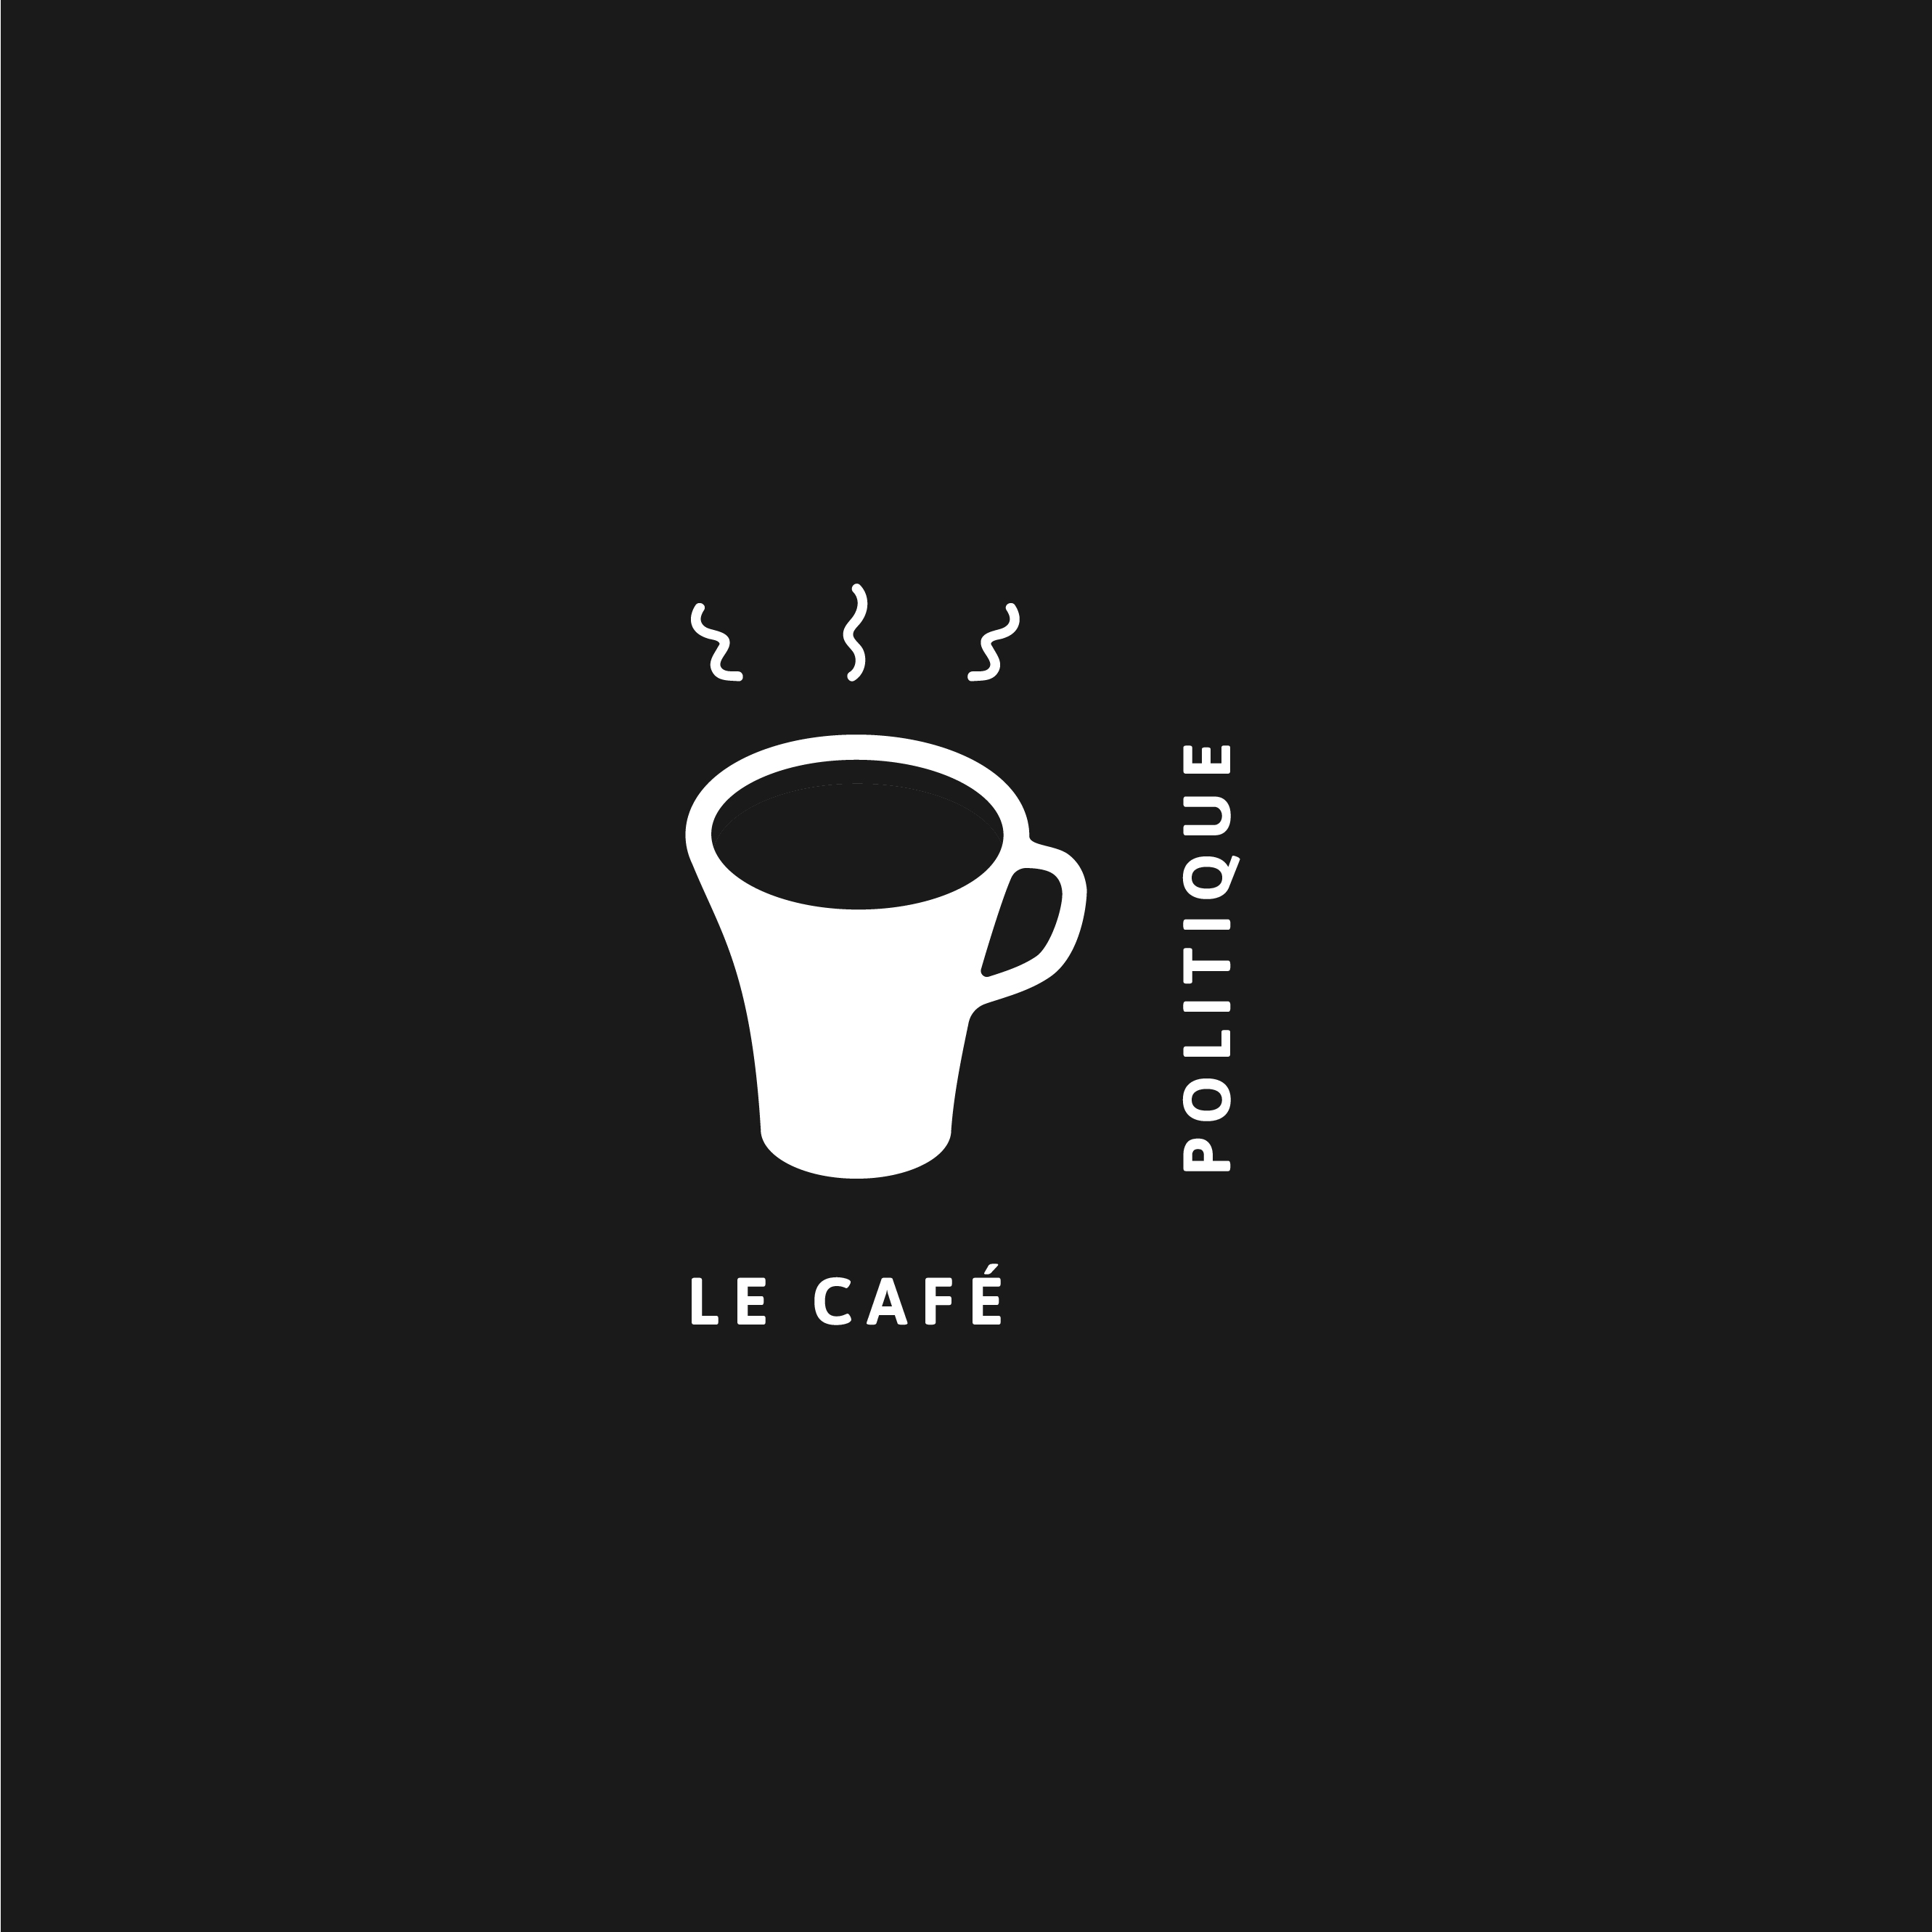 LOGO-CAFE-POLI-NOIR